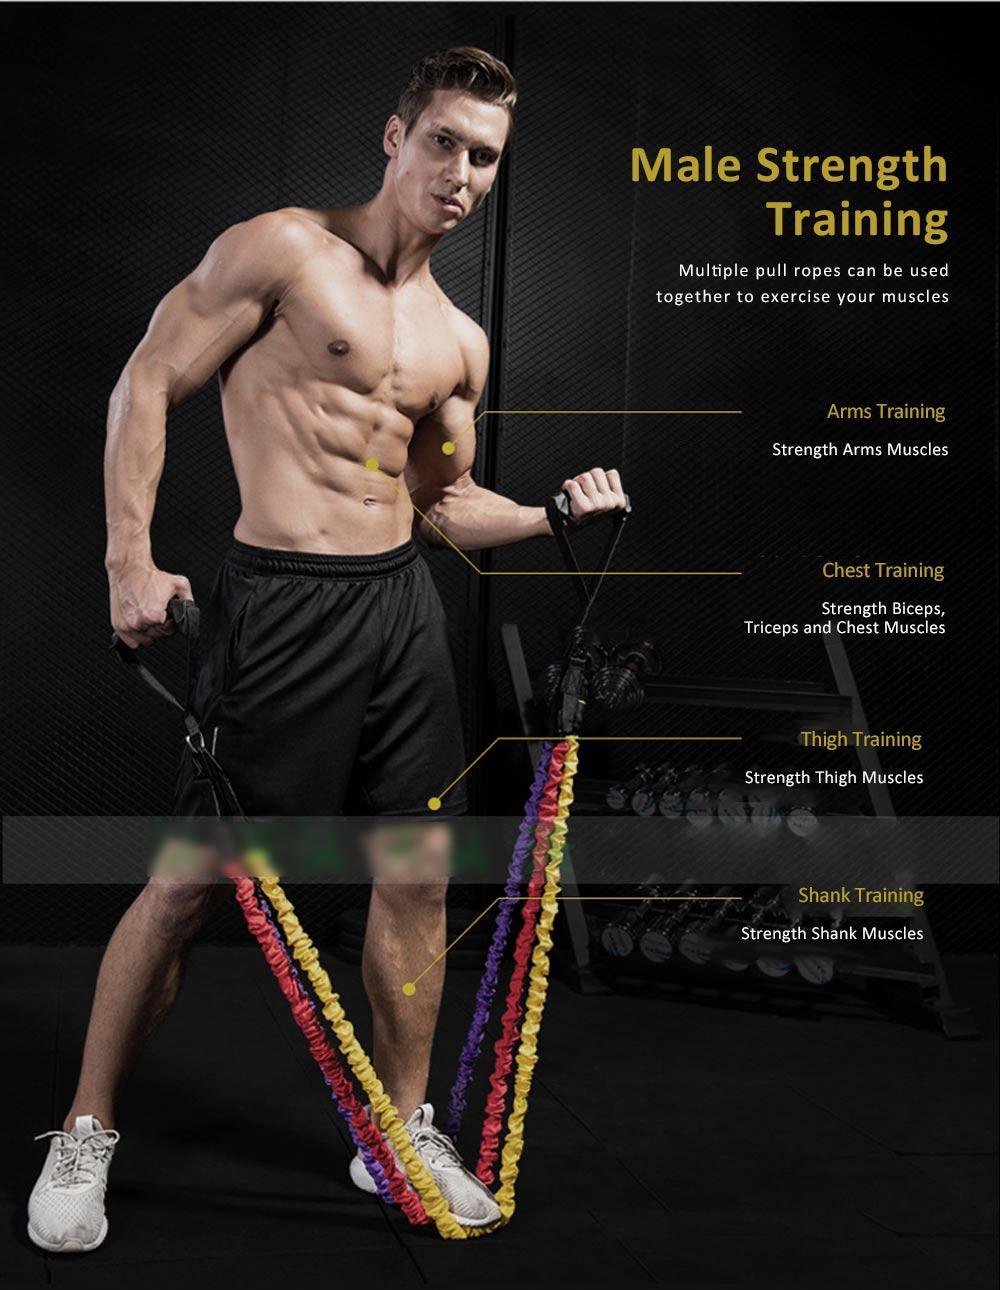 Multifunctional Safe Breaking-proof 11PCS Pull Rope Suit, Gym Yoga Training Exercising Elastic Resistance Band 8